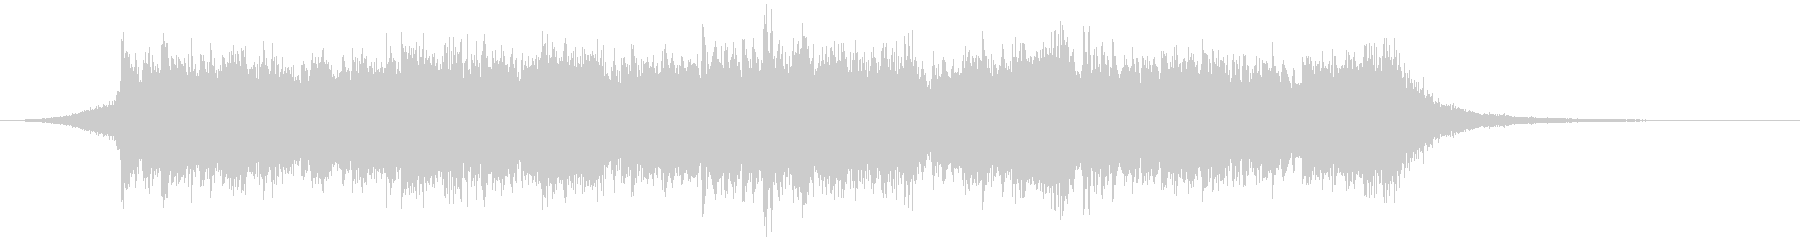 Cinematic Piano&Strings 5の未再生の波形